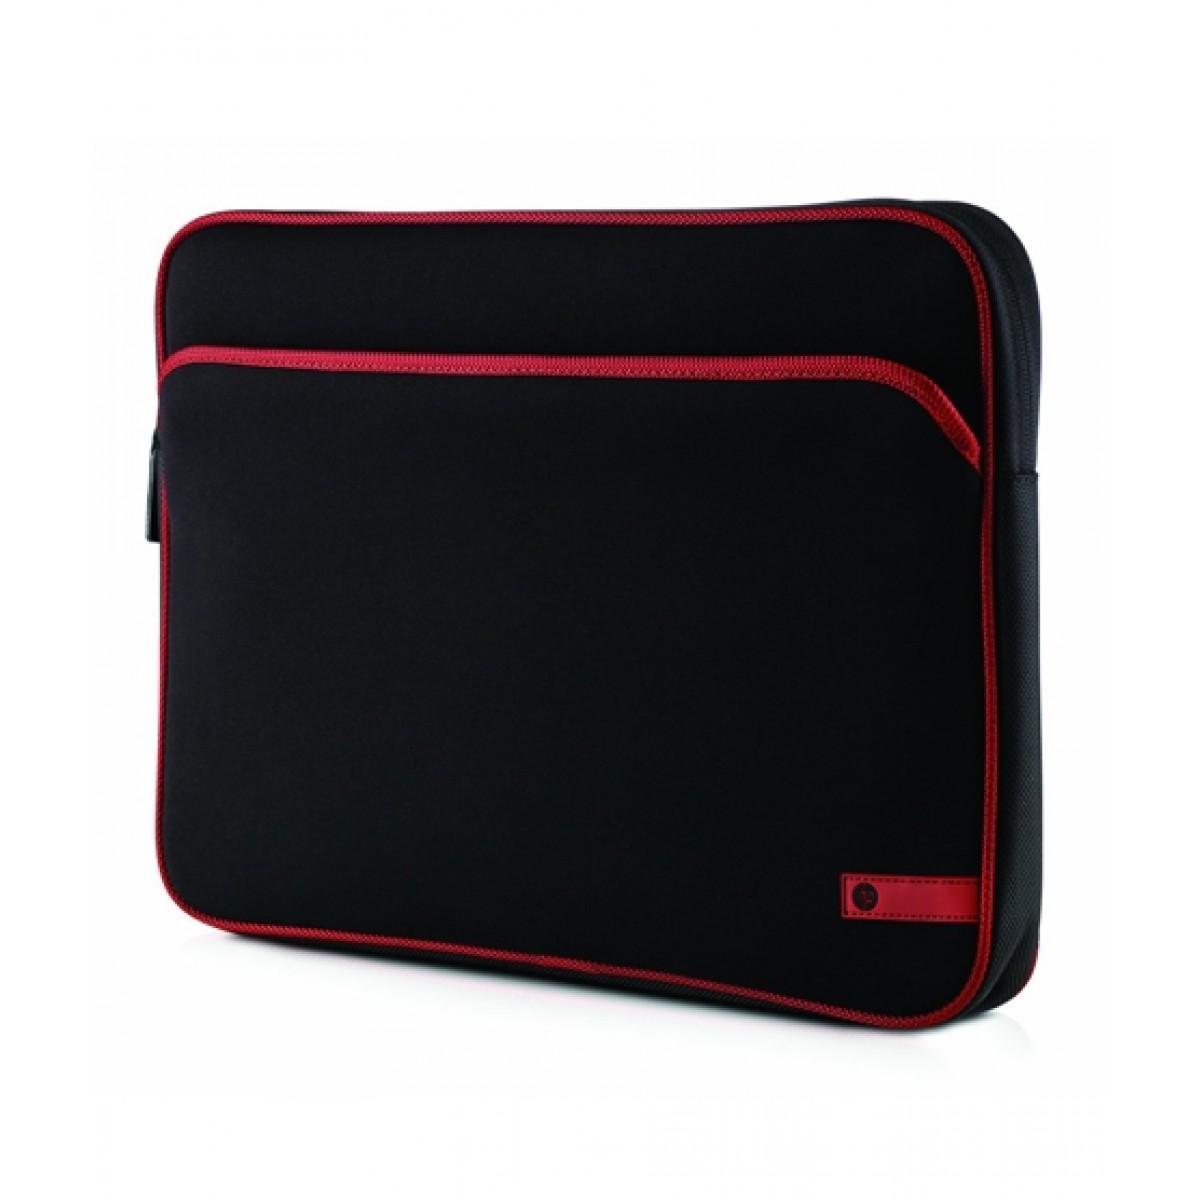 "HP 16"" Notebook Sleeve Black/Red (VZ346AA)"